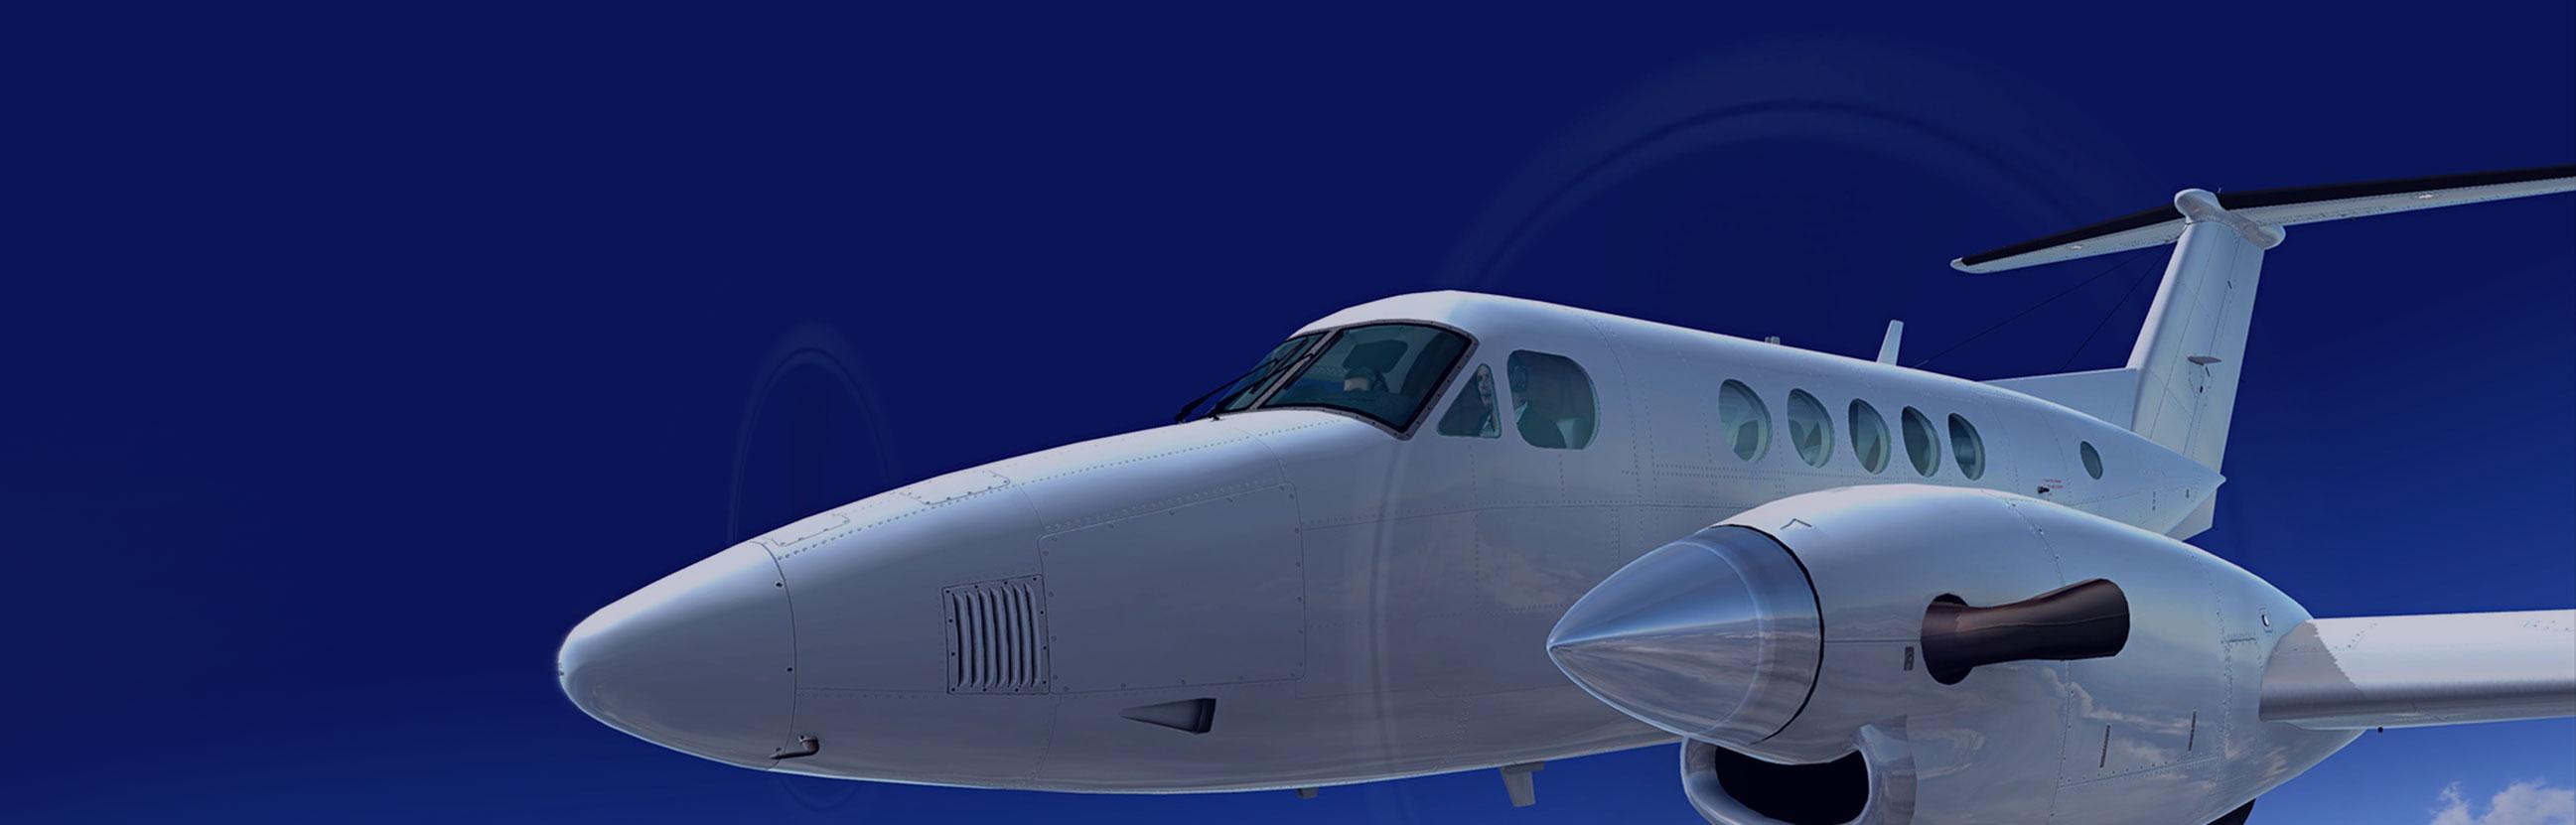 King Air slide